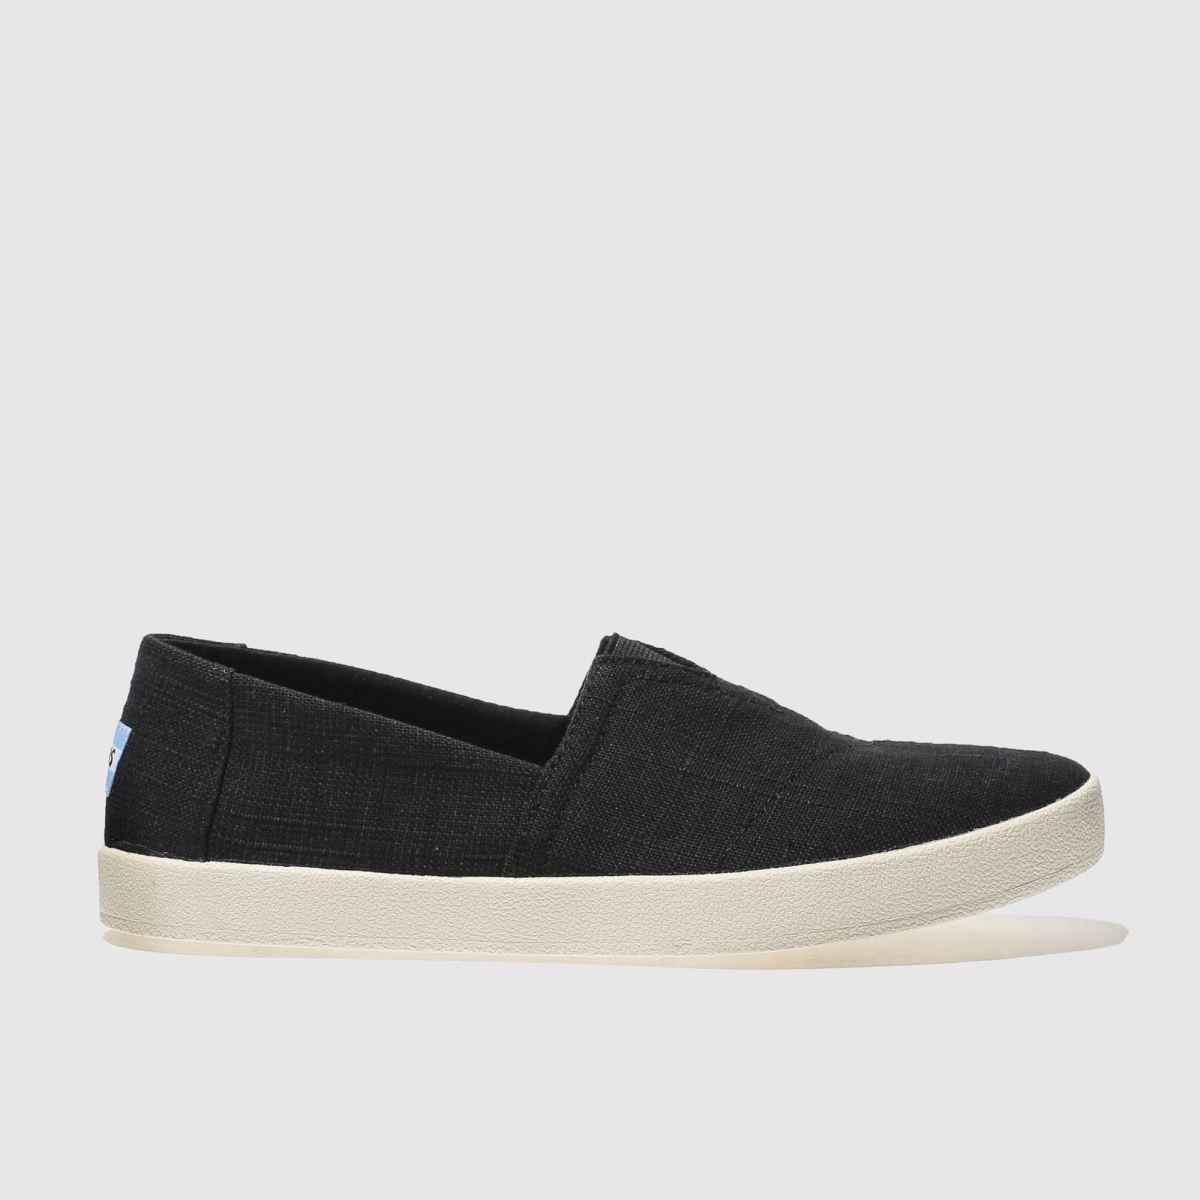 Toms Black Avalon Slip-on Shoes